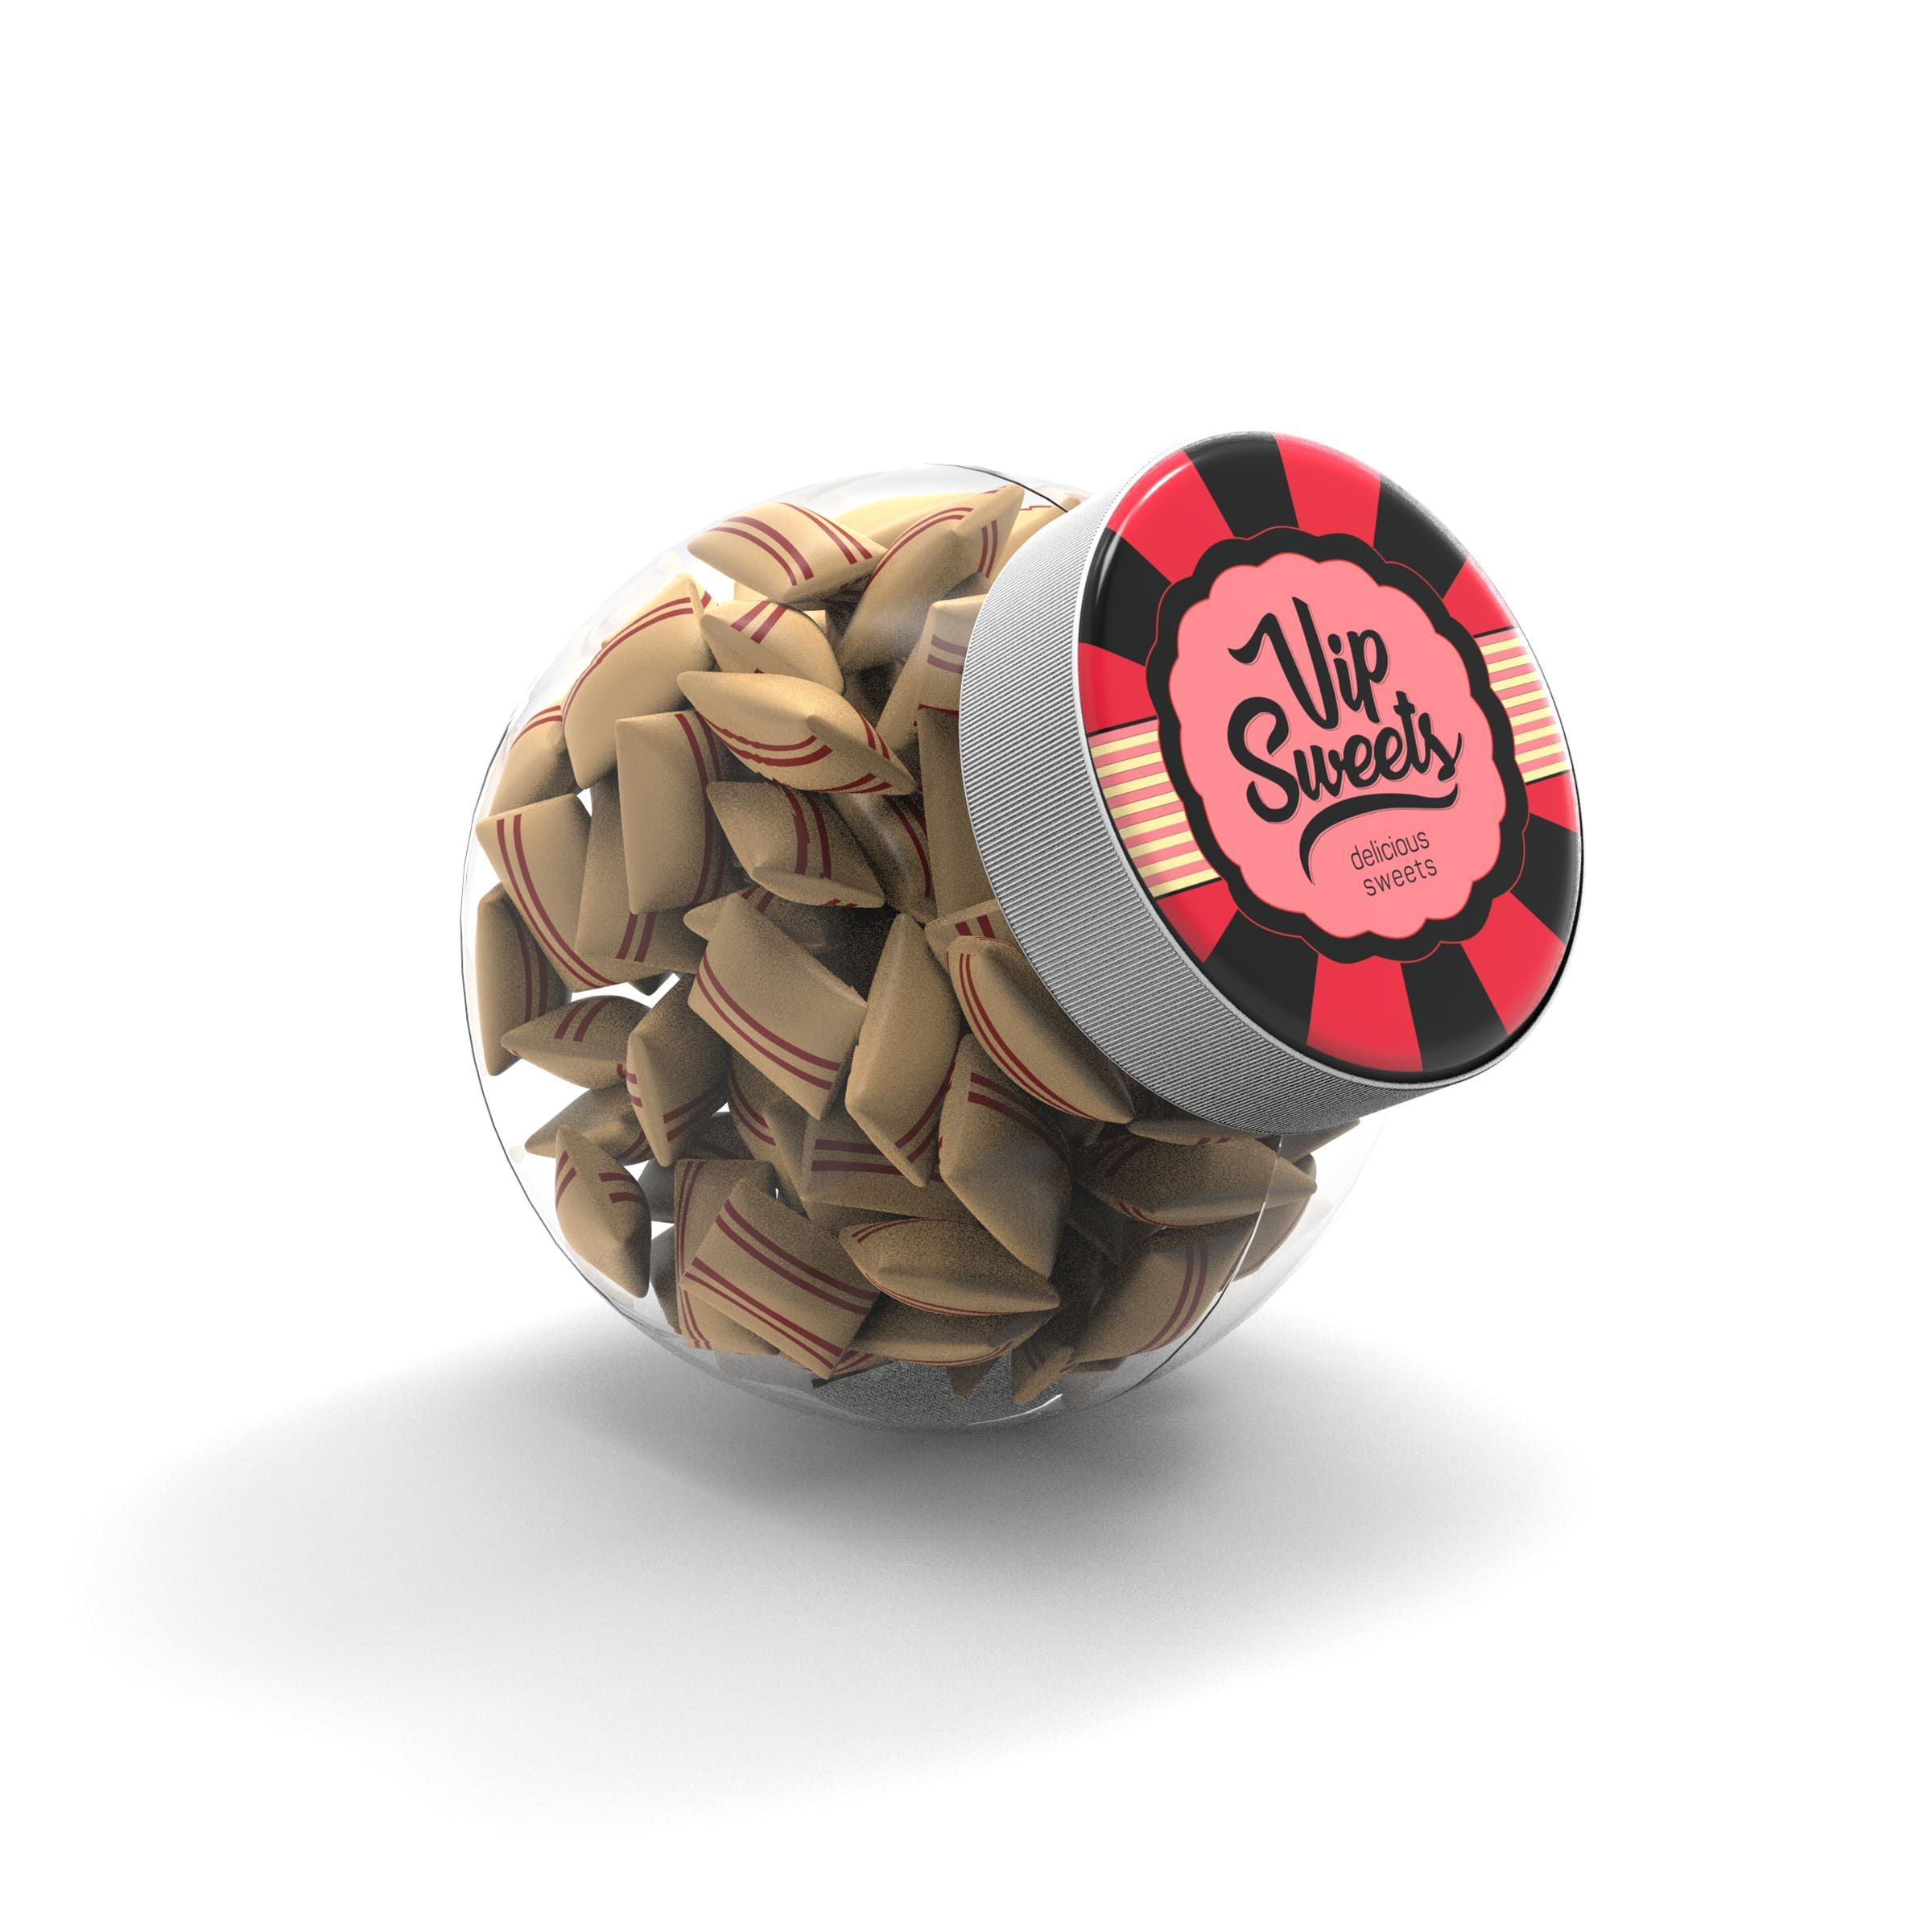 Bonbons 'Made In Holland' avec bonbonnières